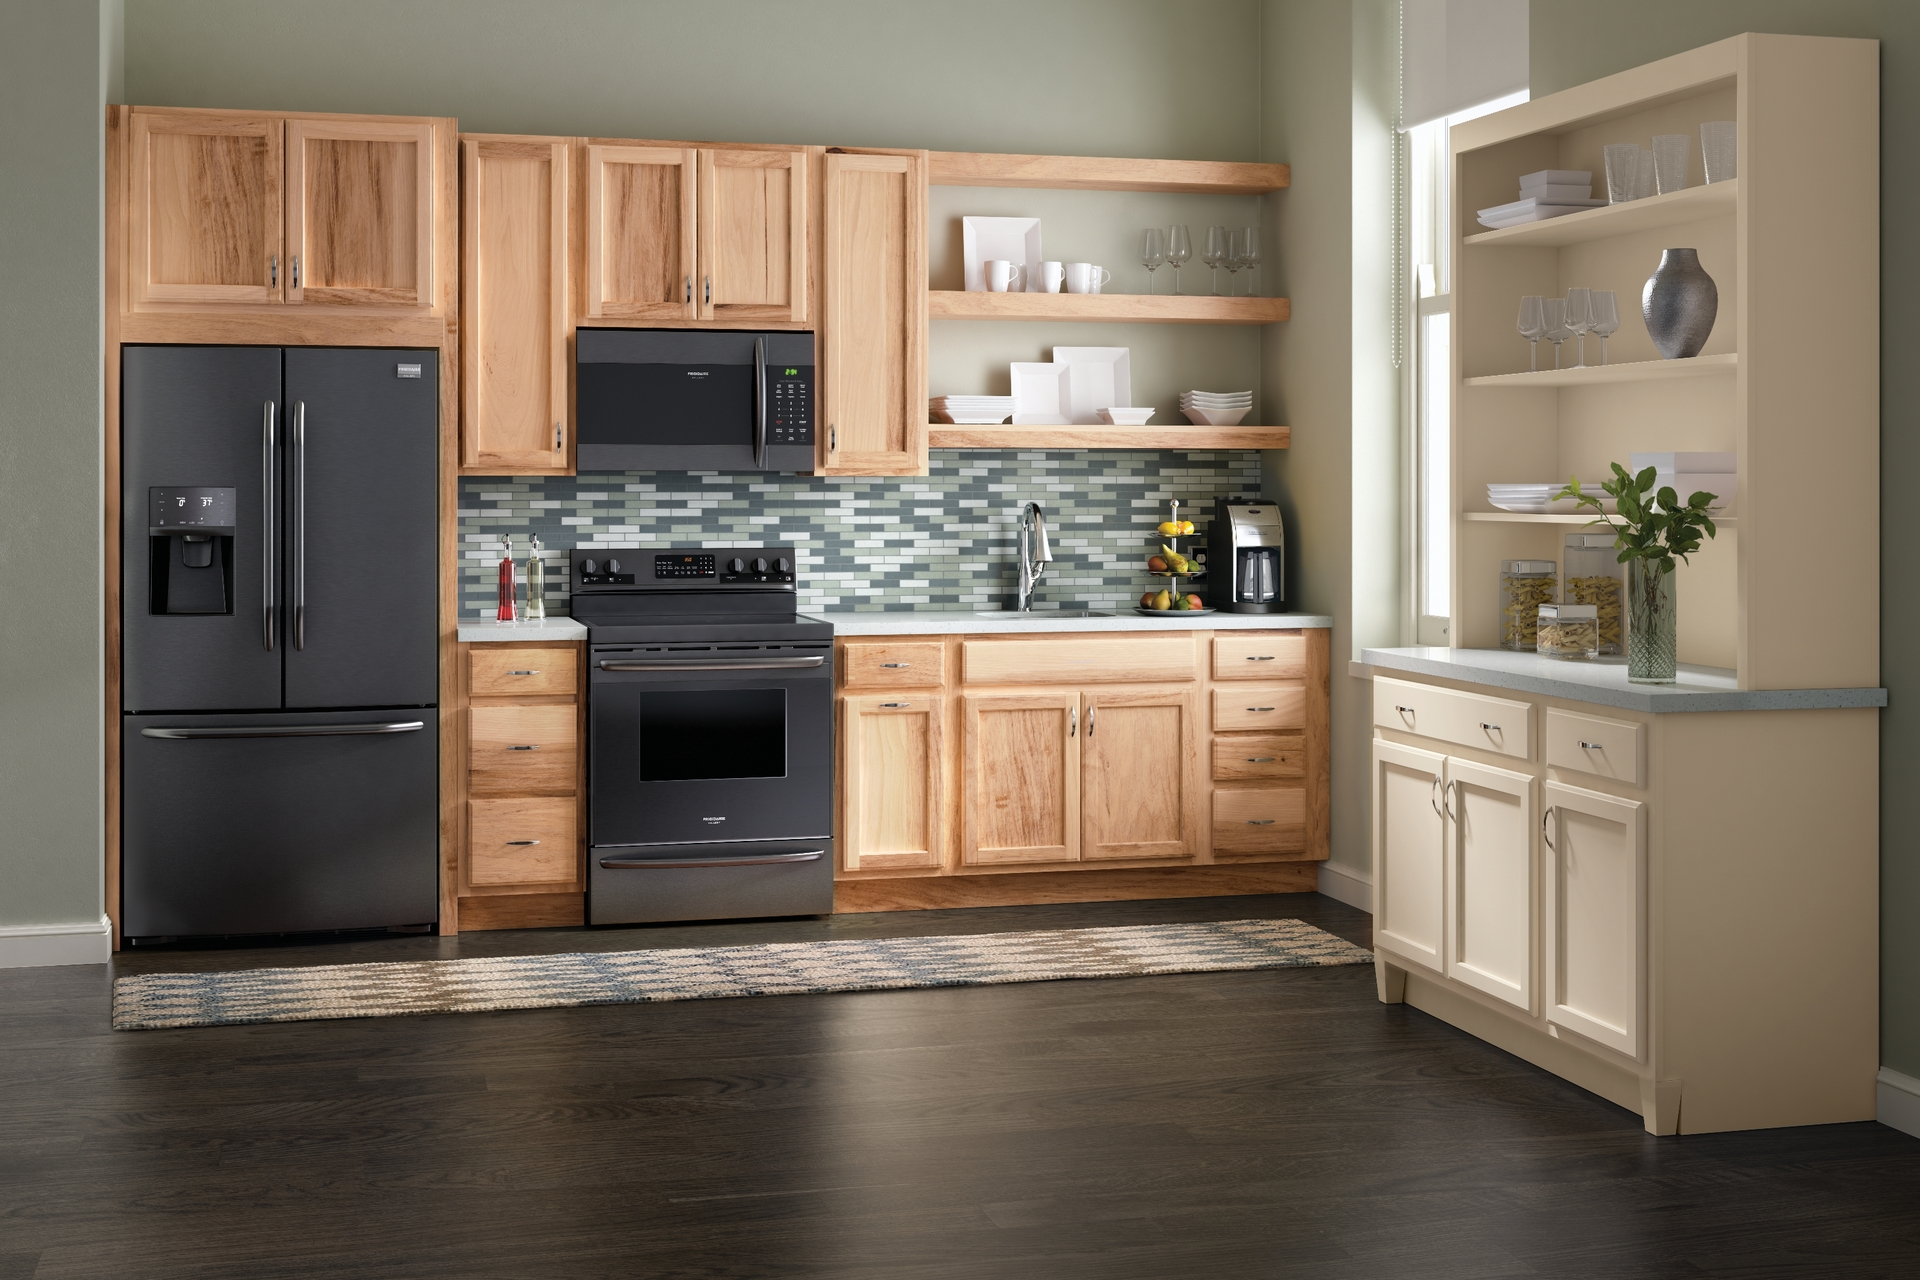 stunning natural maple kitchen cabinets | Cardell Kitchen Cabinets - Springmont Square in Natural